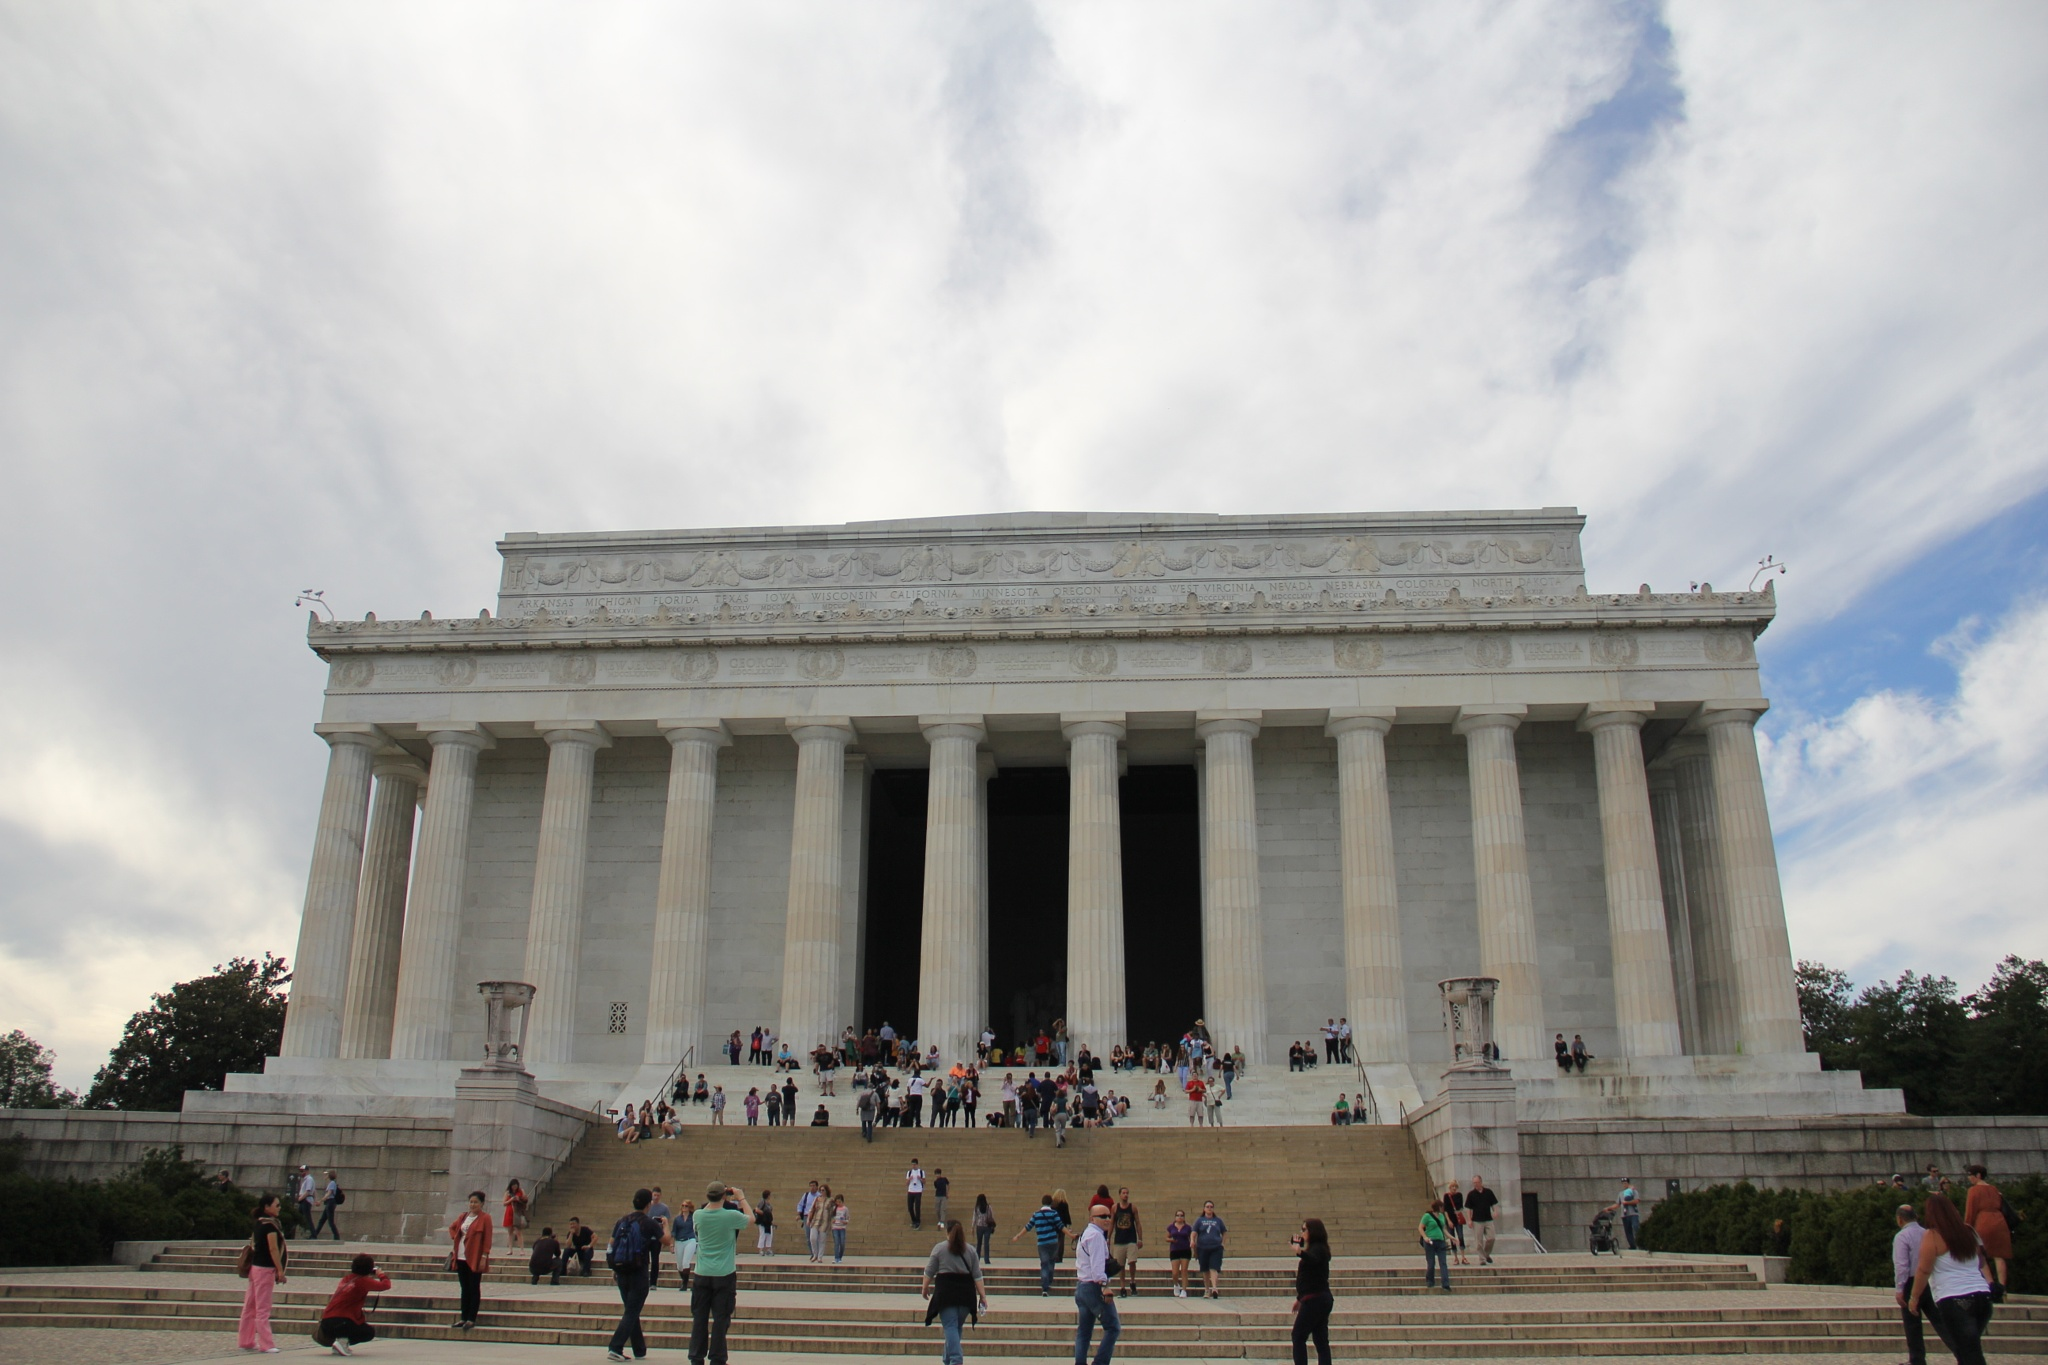 Lincoln Memorial by Daniel Buchbinder